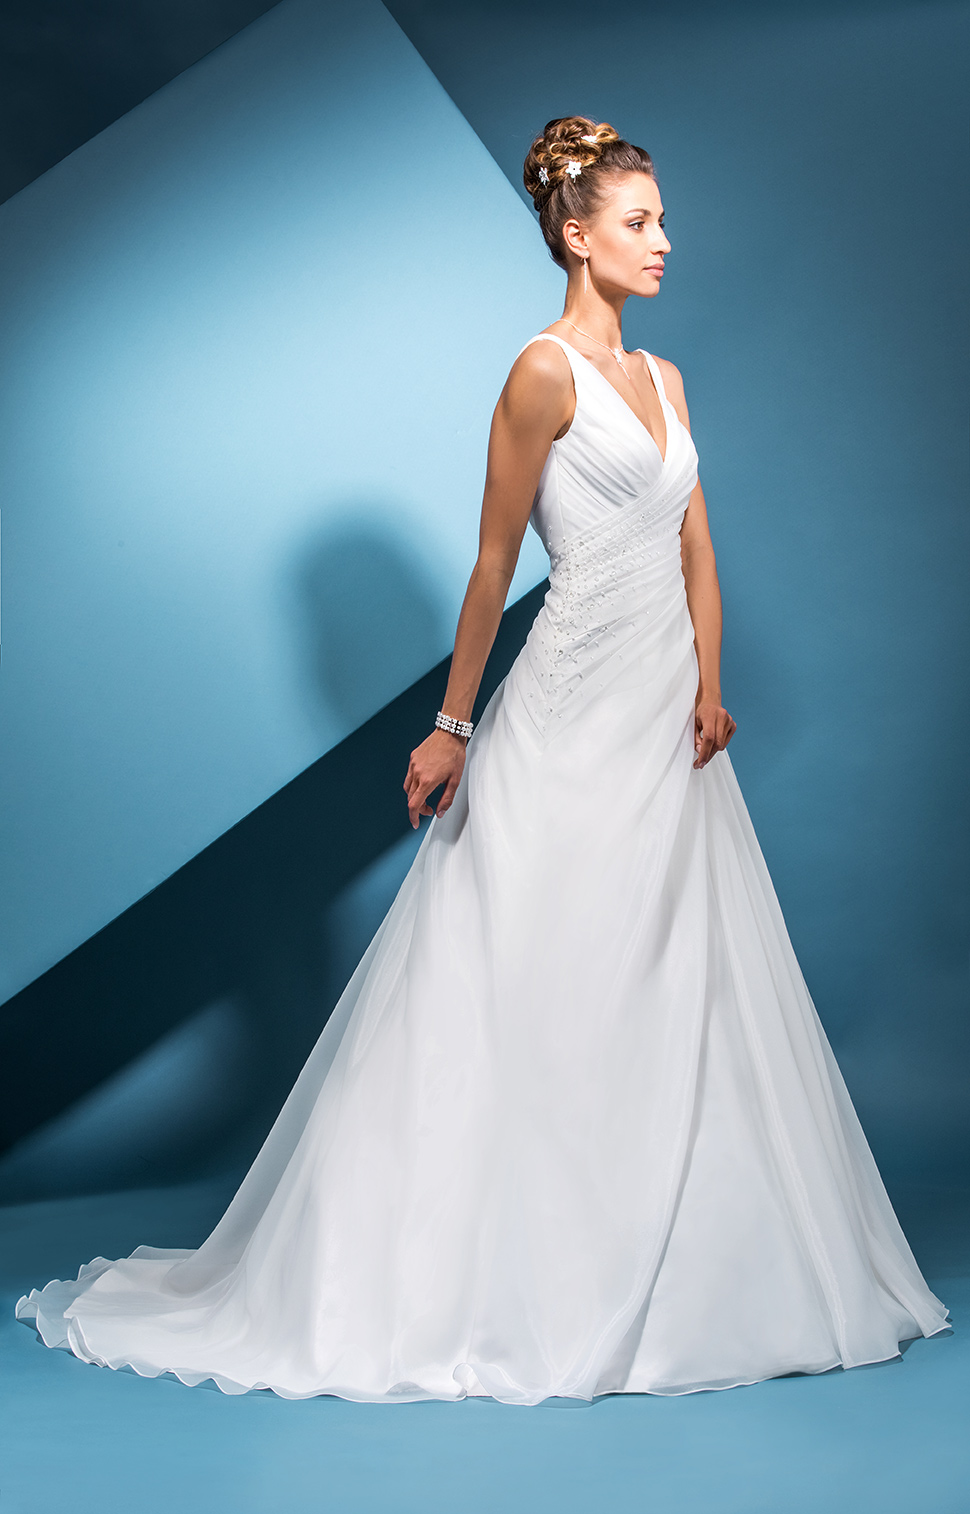 Wedding Dresses Bucks, Berks - Sapphire Dresses : Sapphire Dresses